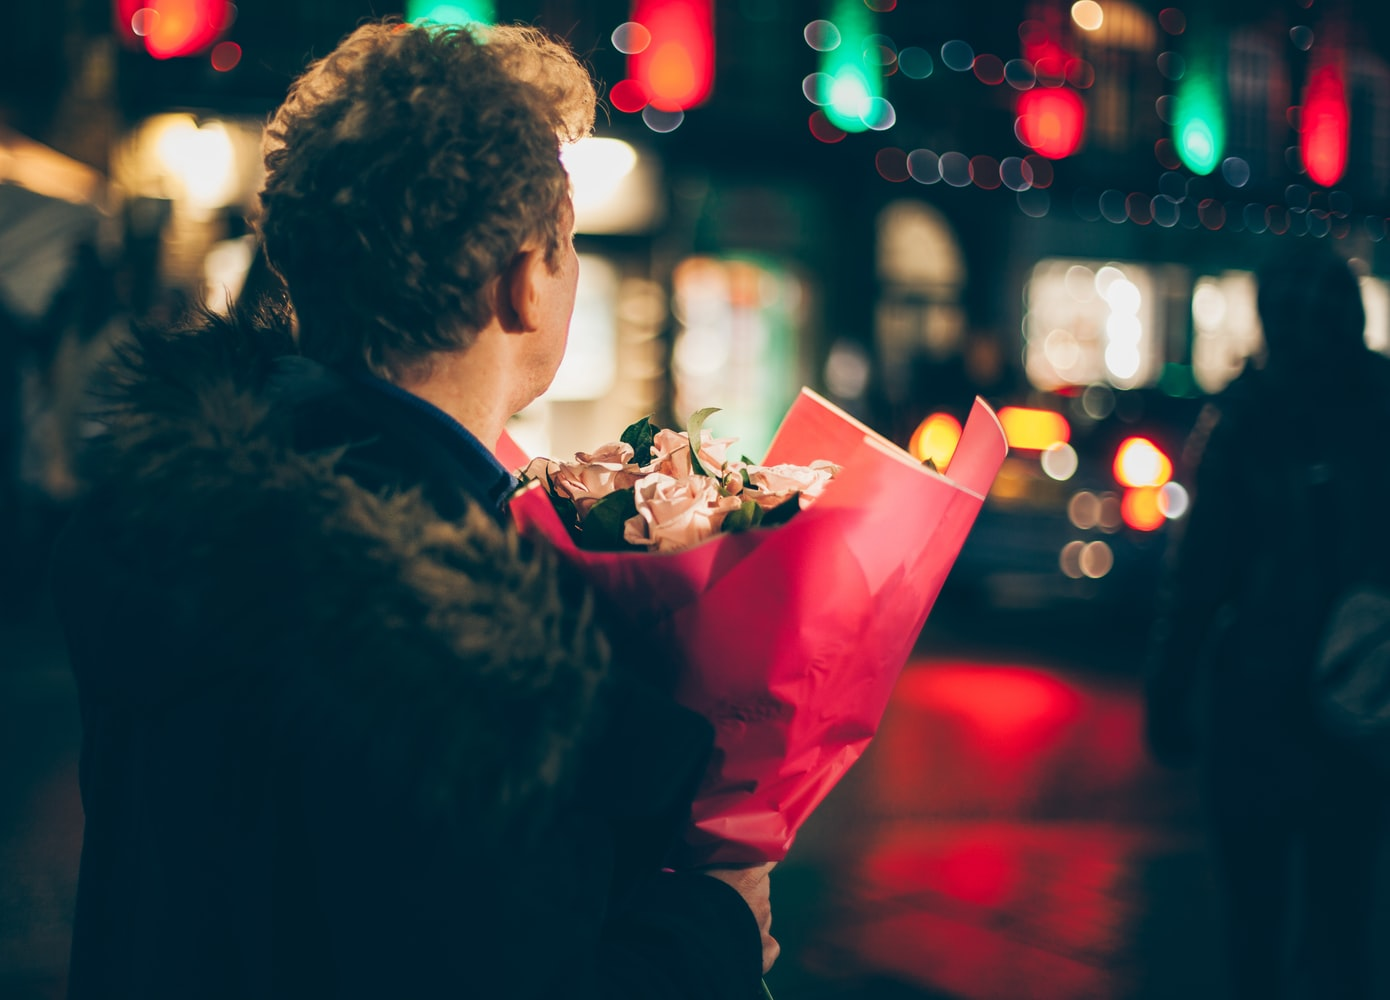 sevgililer gününün